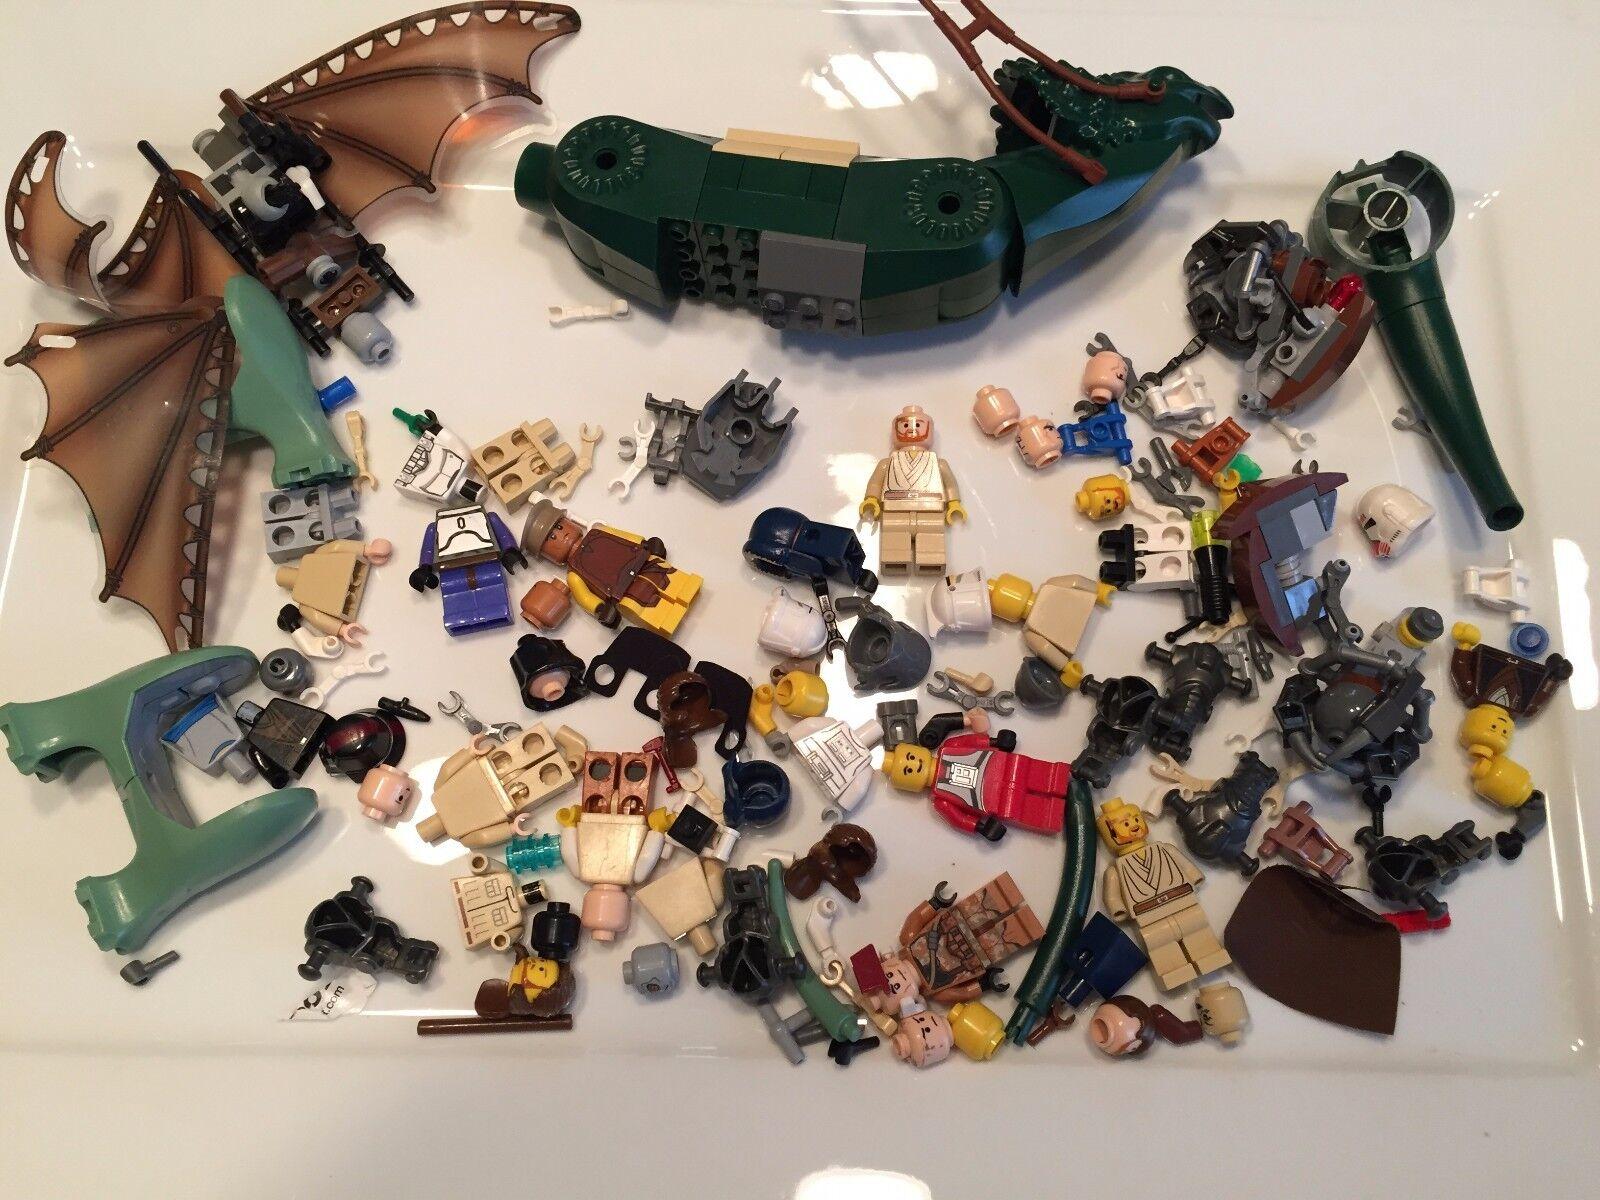 8 Ounces Lego Star Wars Minifig parts Boga 1/2 Pound minifigures Lot W338